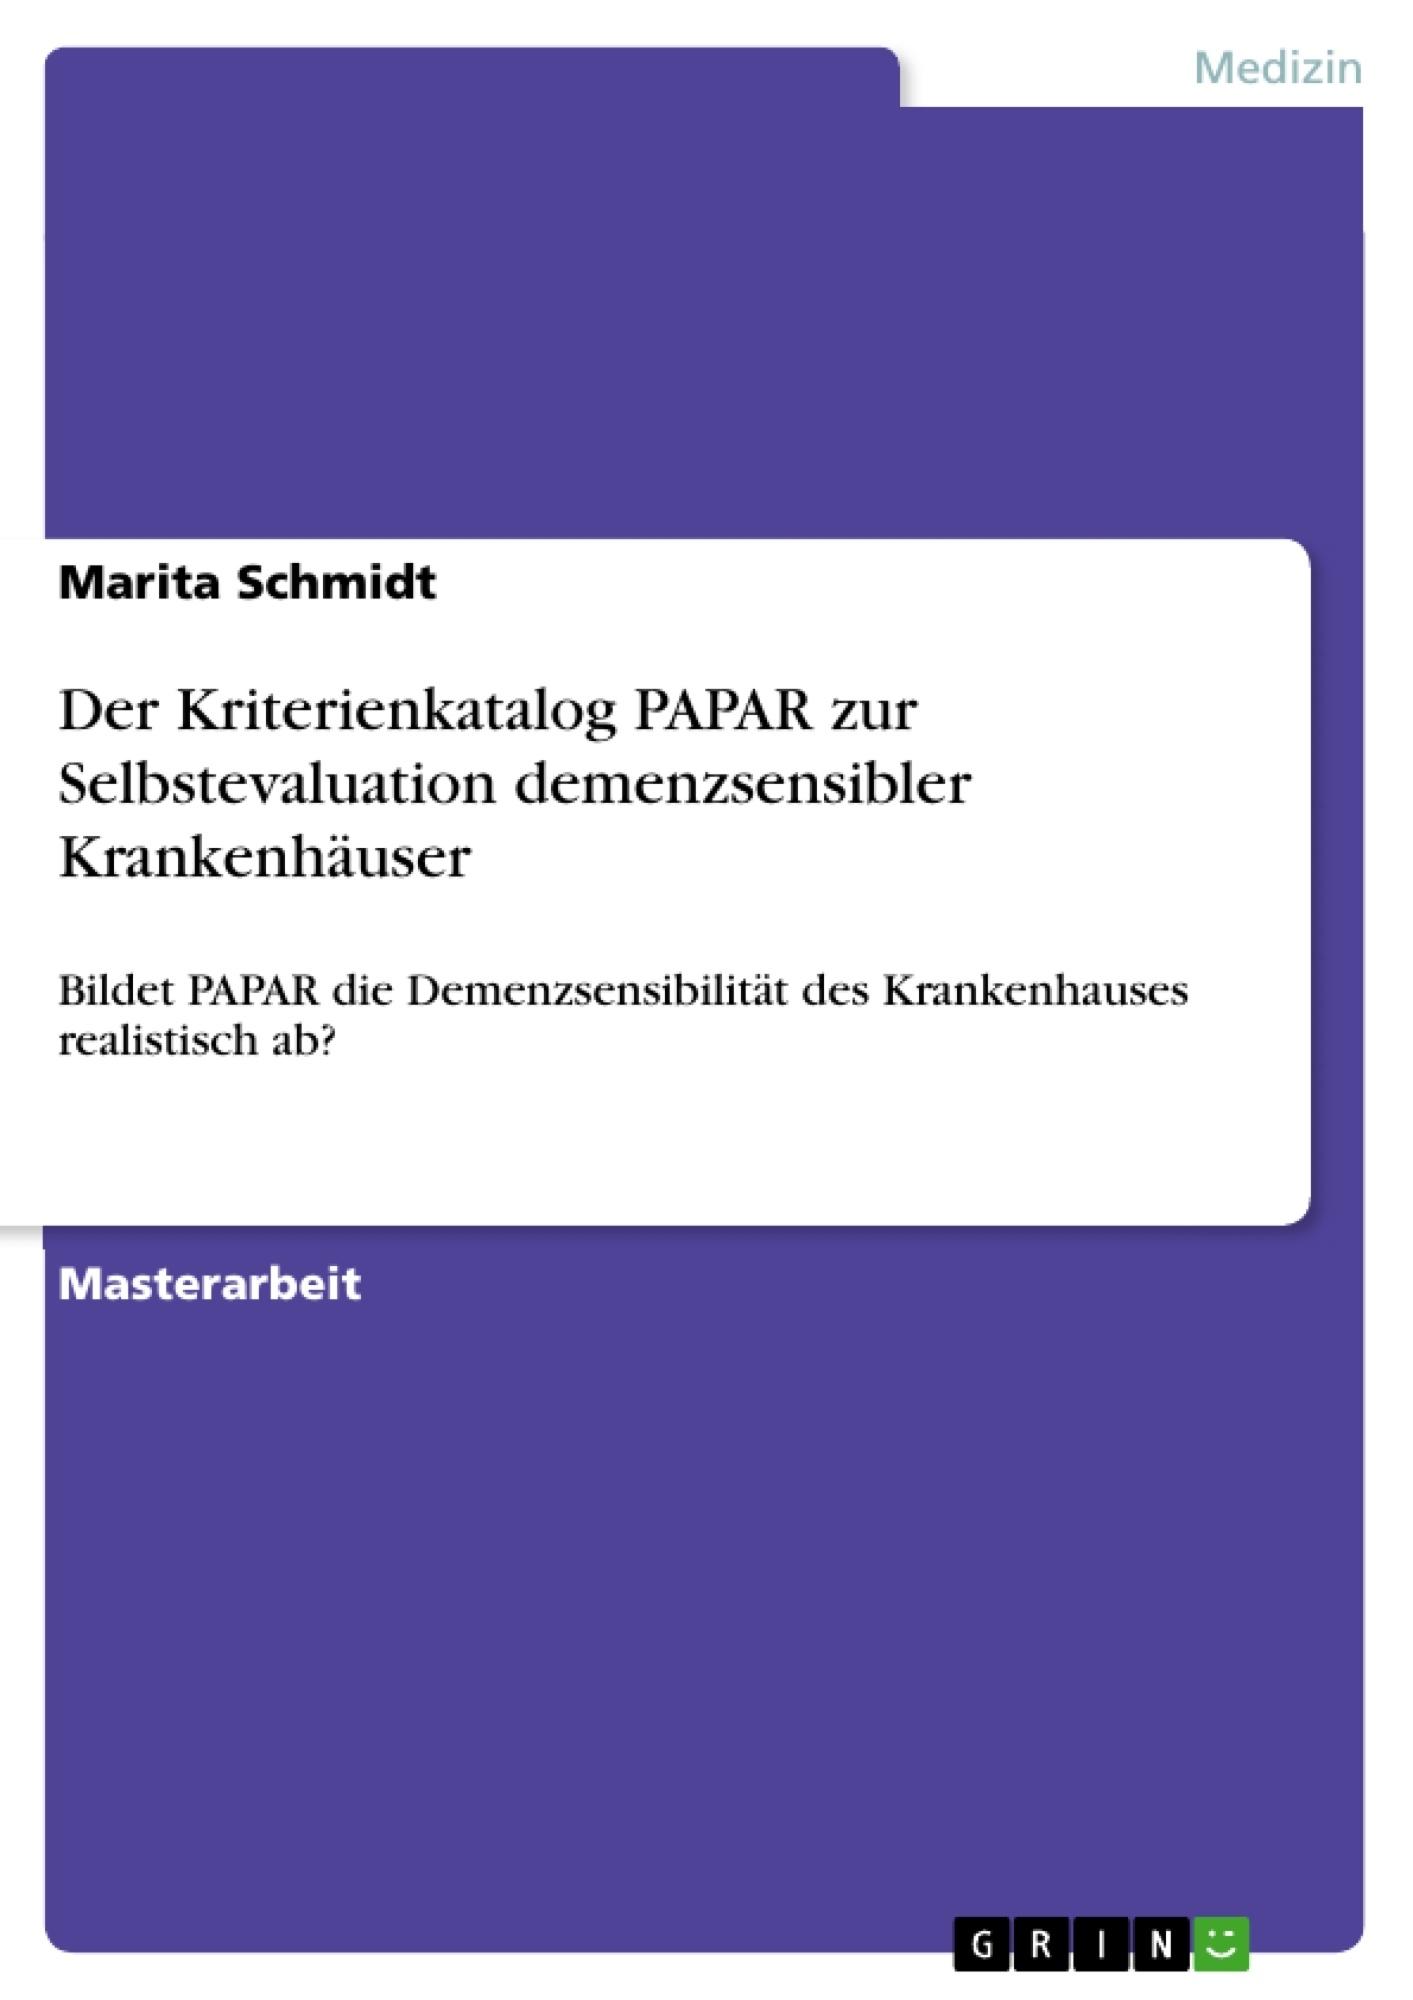 Titel: Der Kriterienkatalog PAPAR zur Selbstevaluation demenzsensibler Krankenhäuser